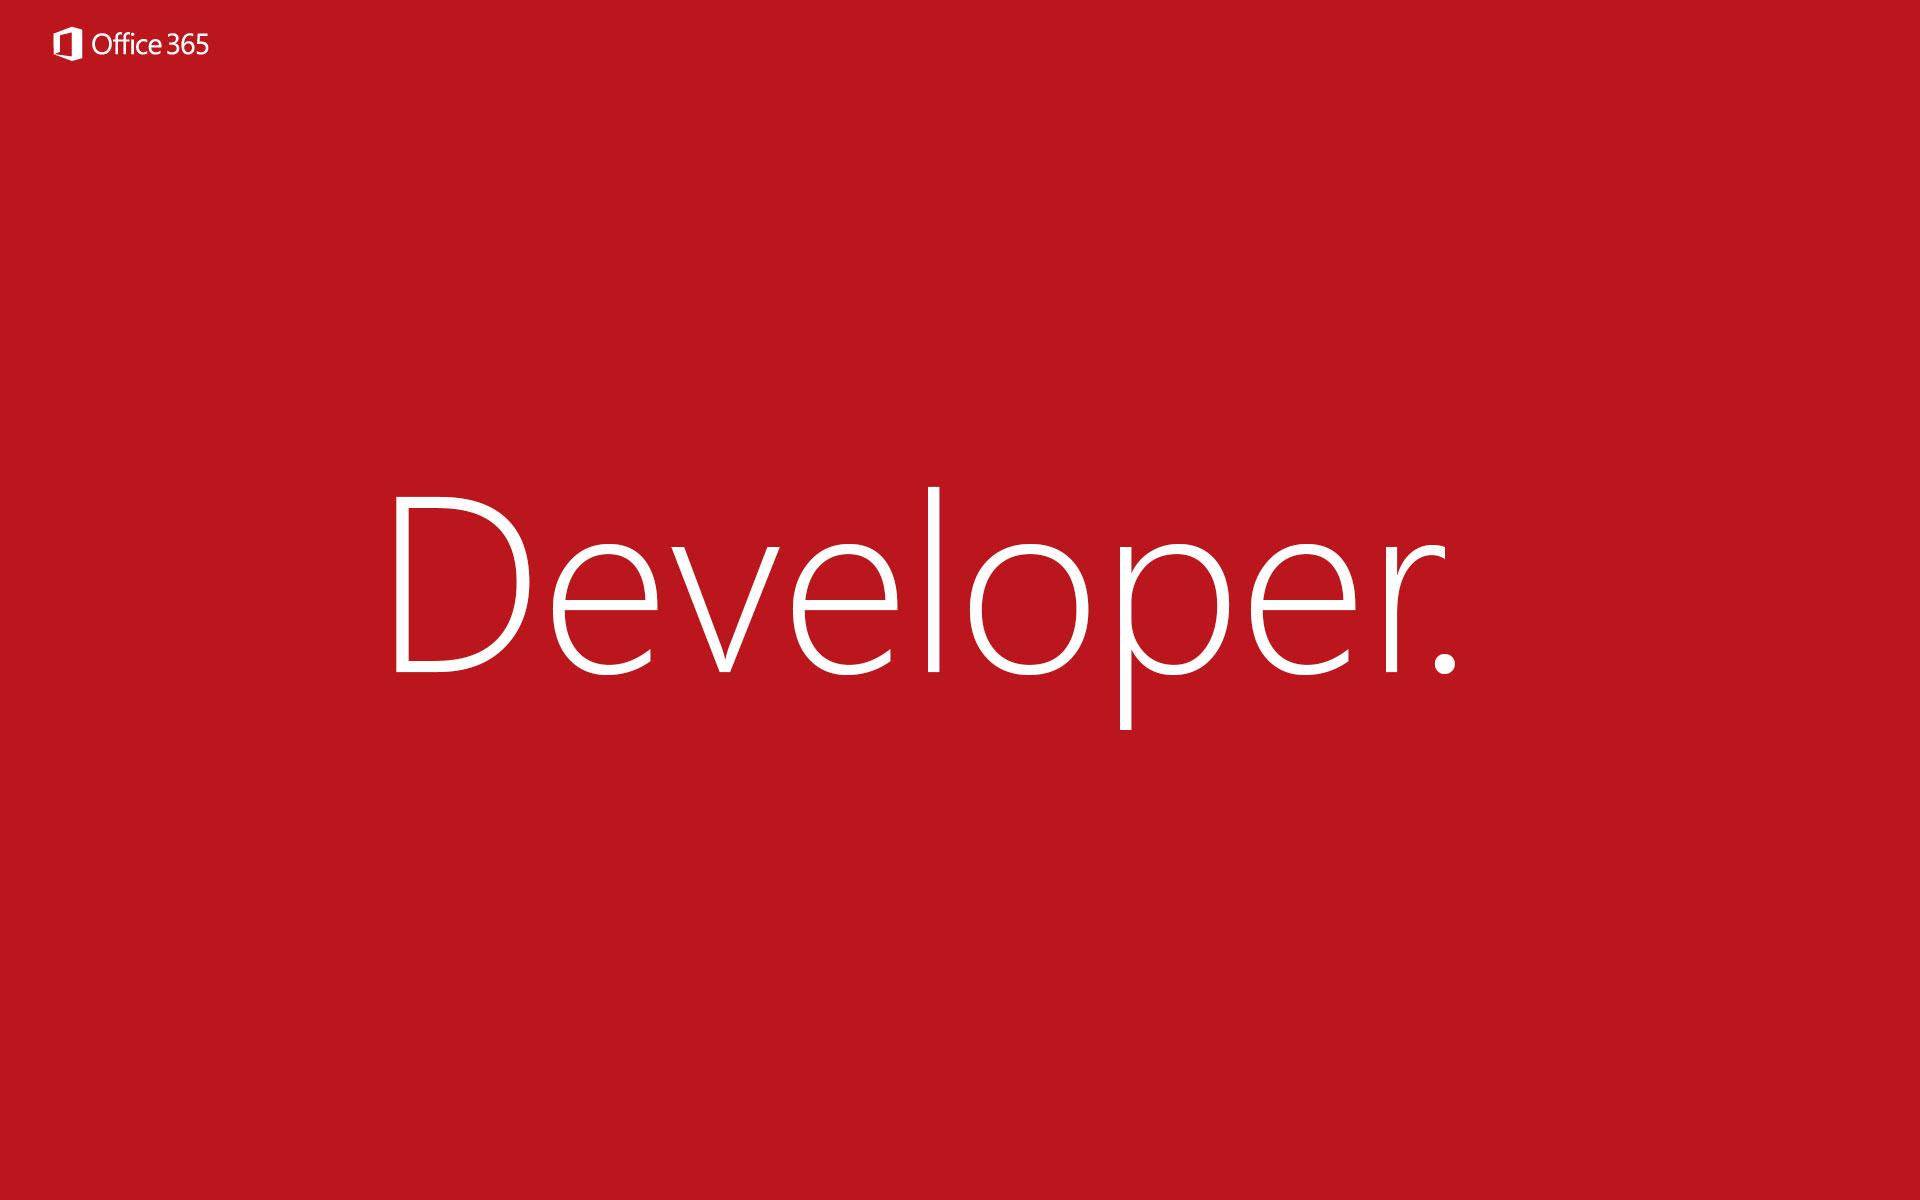 web designer hd wallpaper